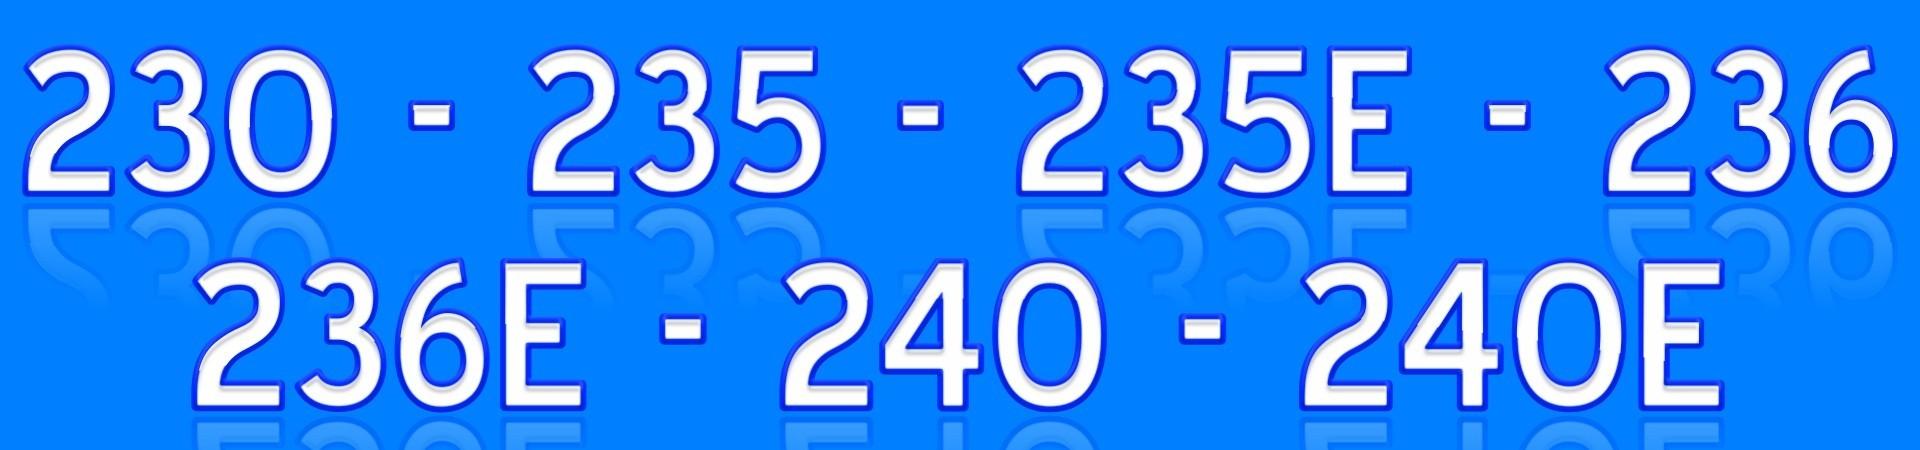 235 236 240